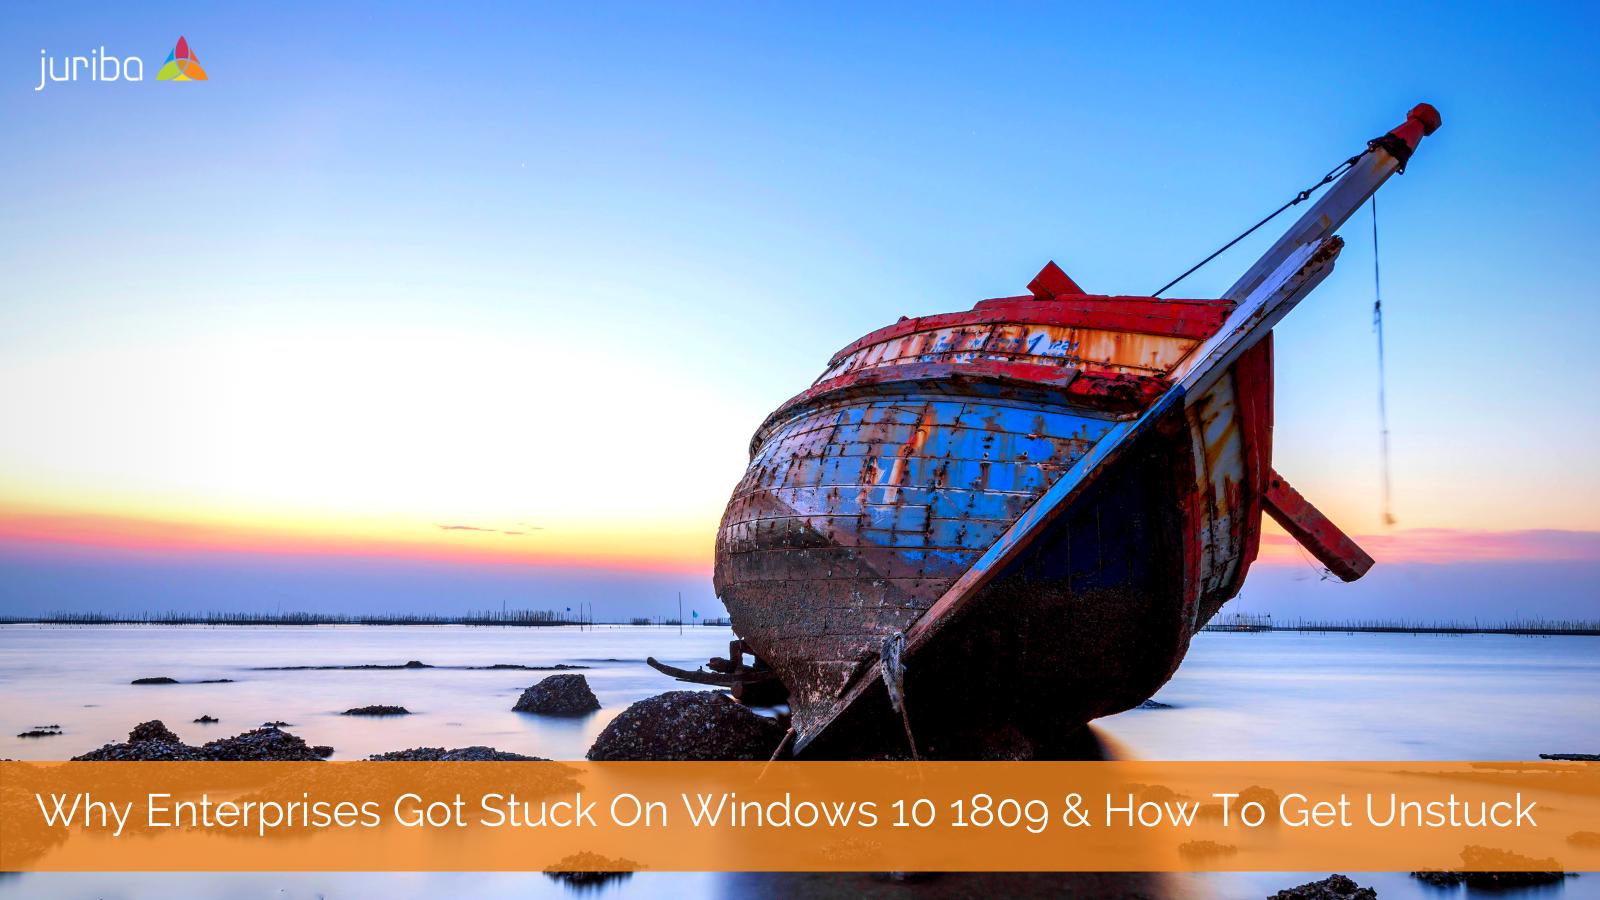 Why Enterprises Got Stuck On Windows 10 1809 & How To Get Unstuck